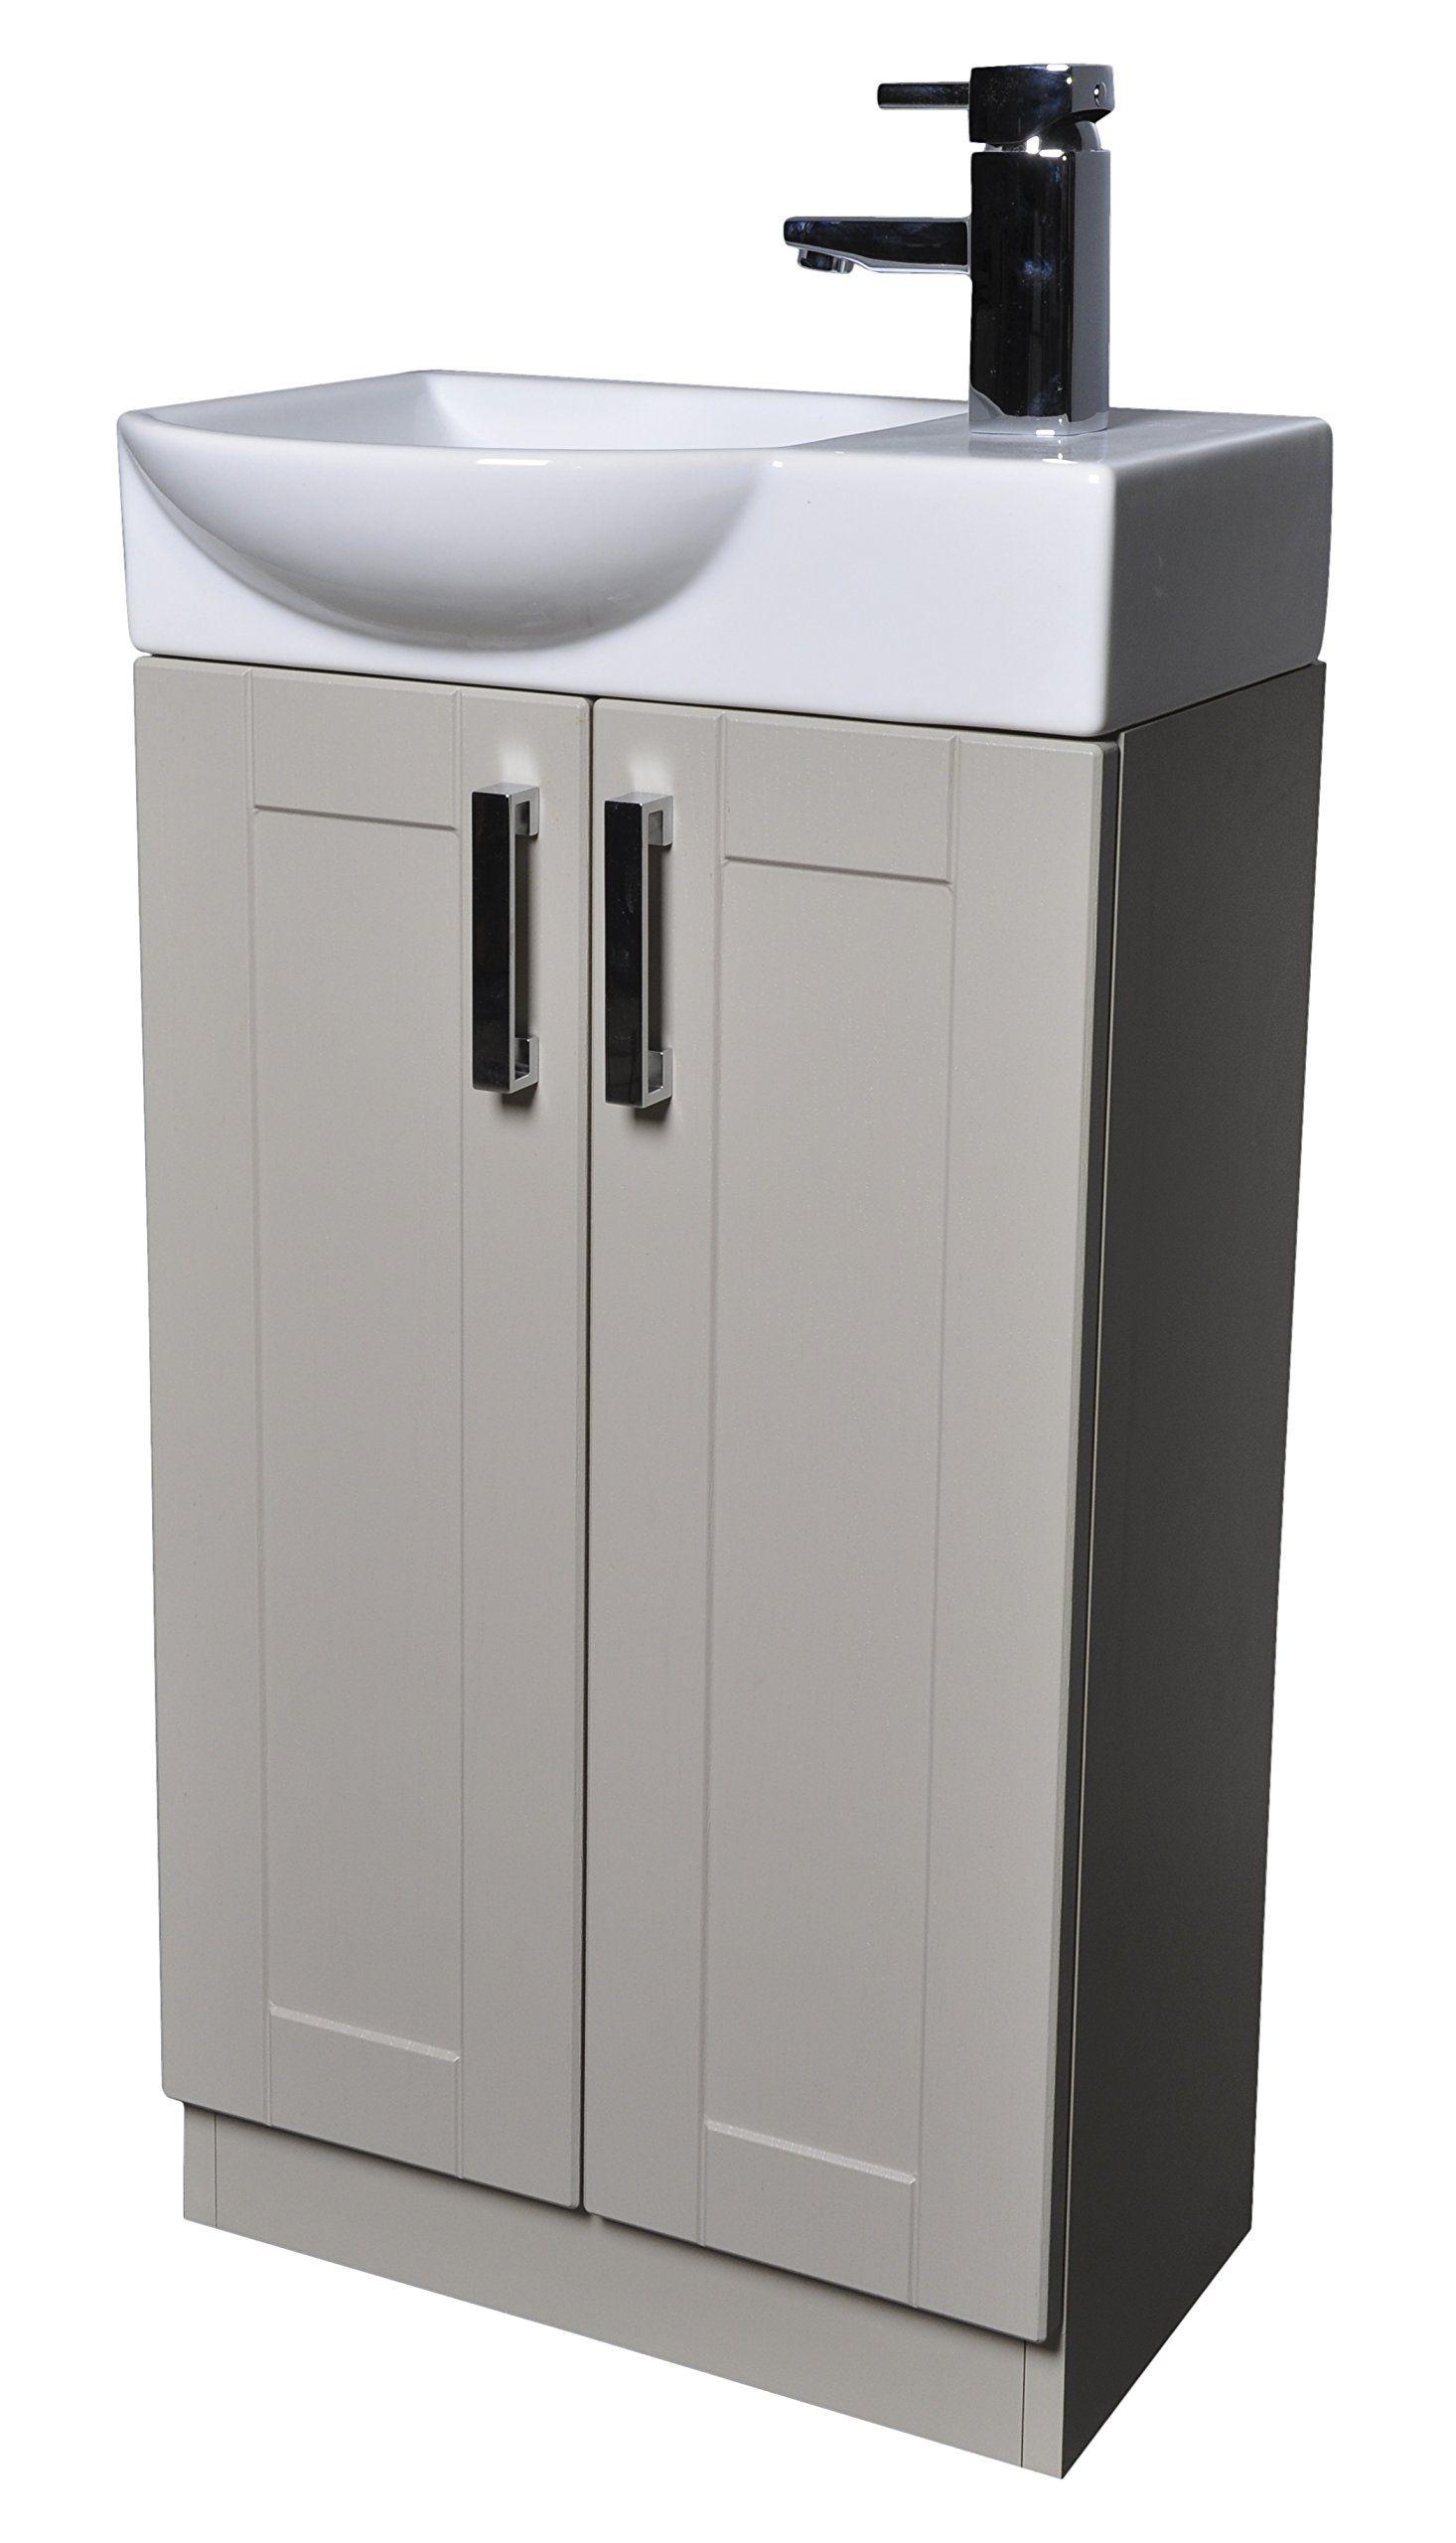 Grey Green Shaker 450mm Cloakroom Bathroom Vanity Unit Curved Basin Sink  Tap   Left Hand BasinGrey Green Shaker 450mm Cloakroom Bathroom Vanity Unit Curved  . Sink With Vanity Unit. Home Design Ideas